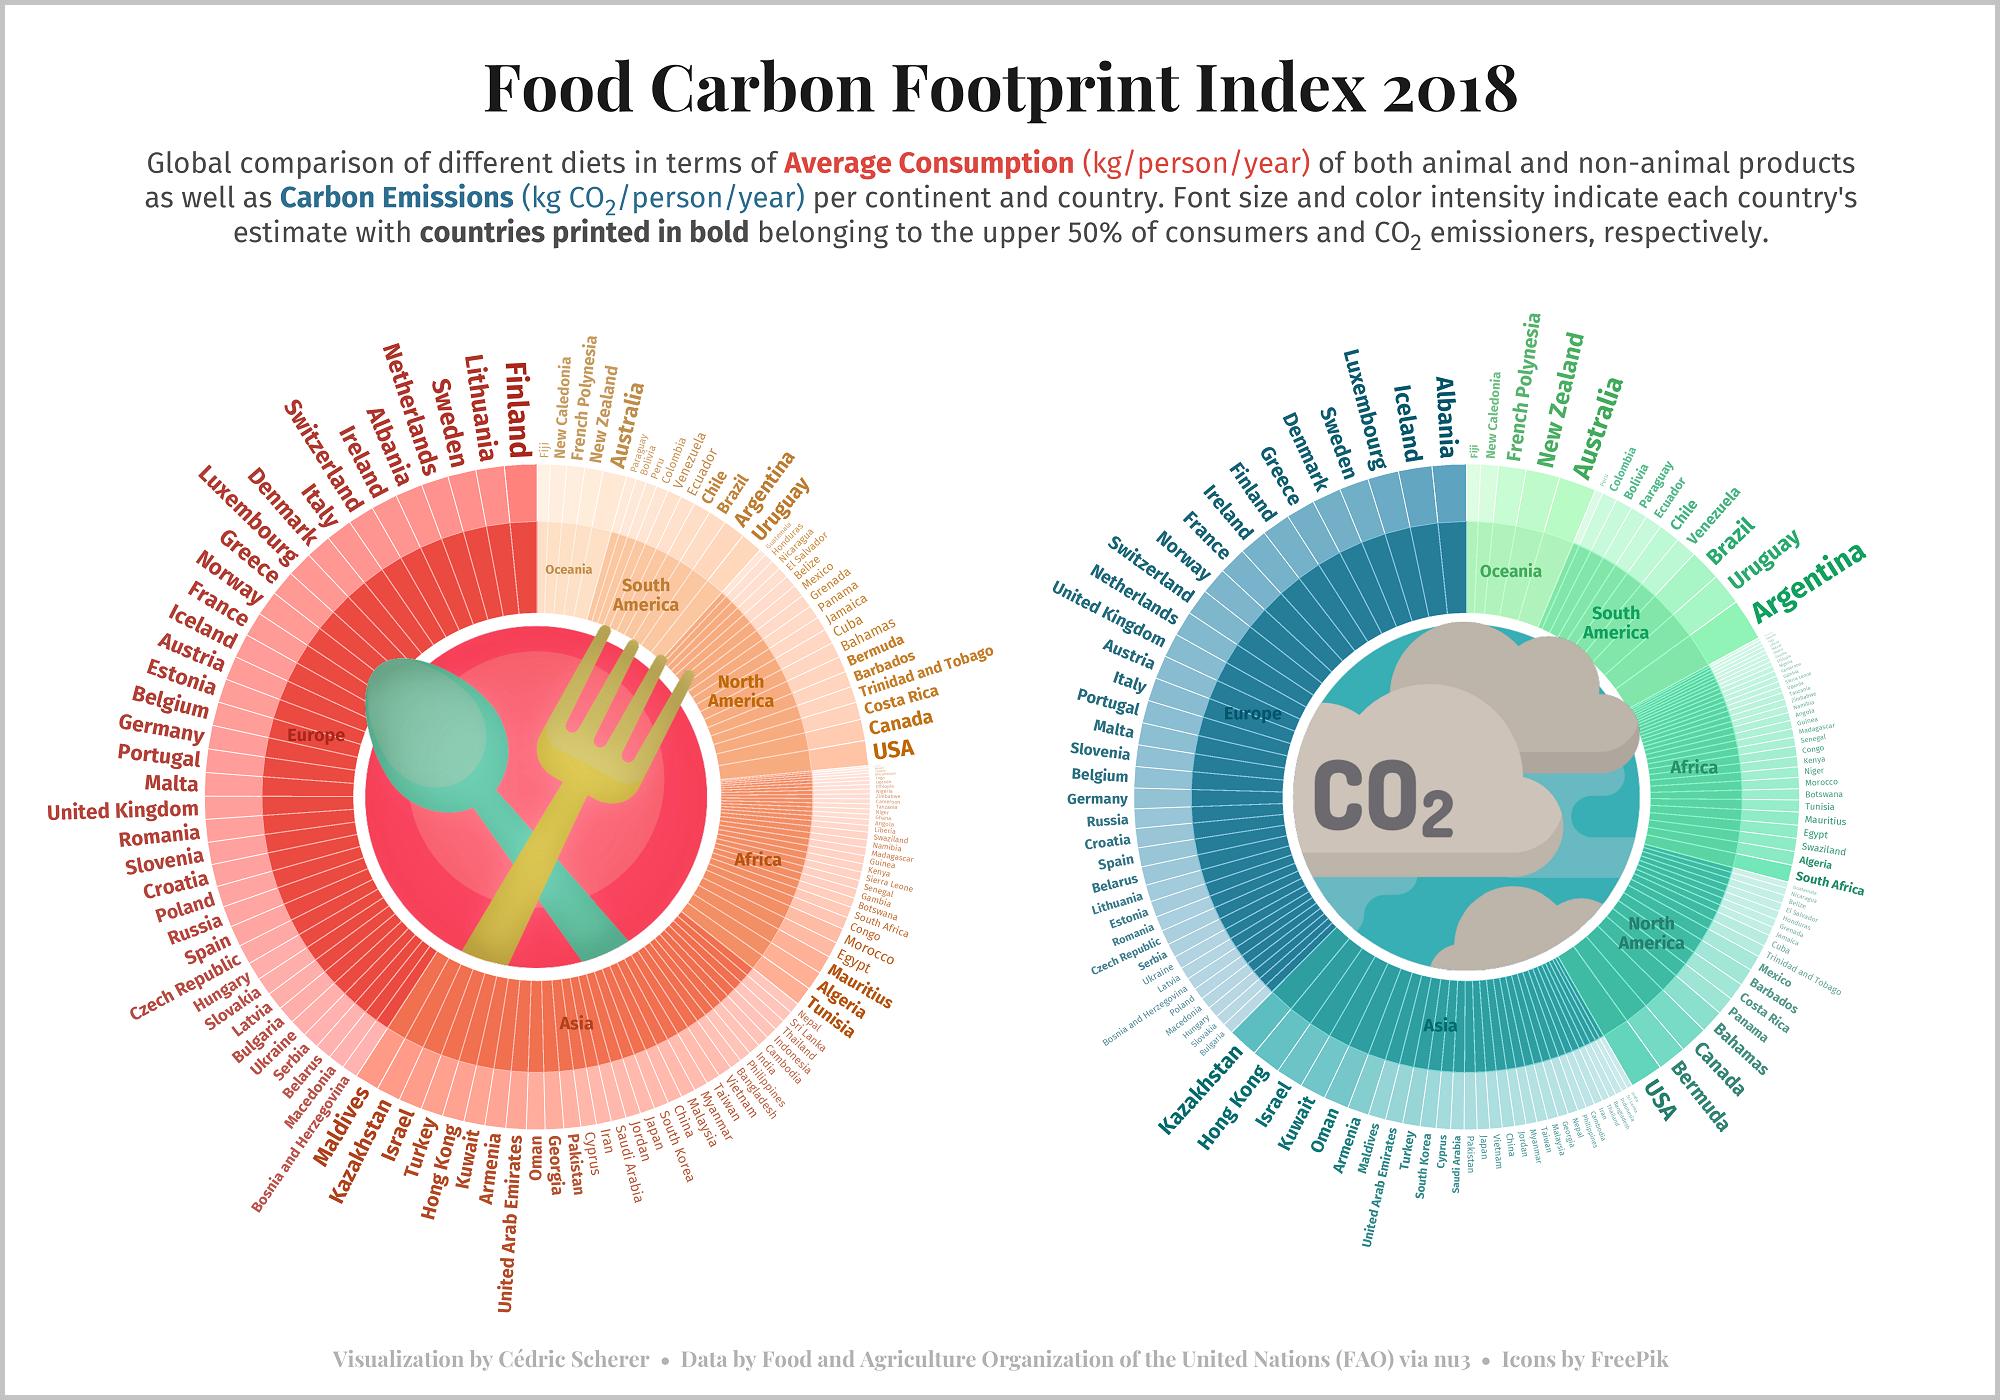 Food Carbon Footprint Index 2018